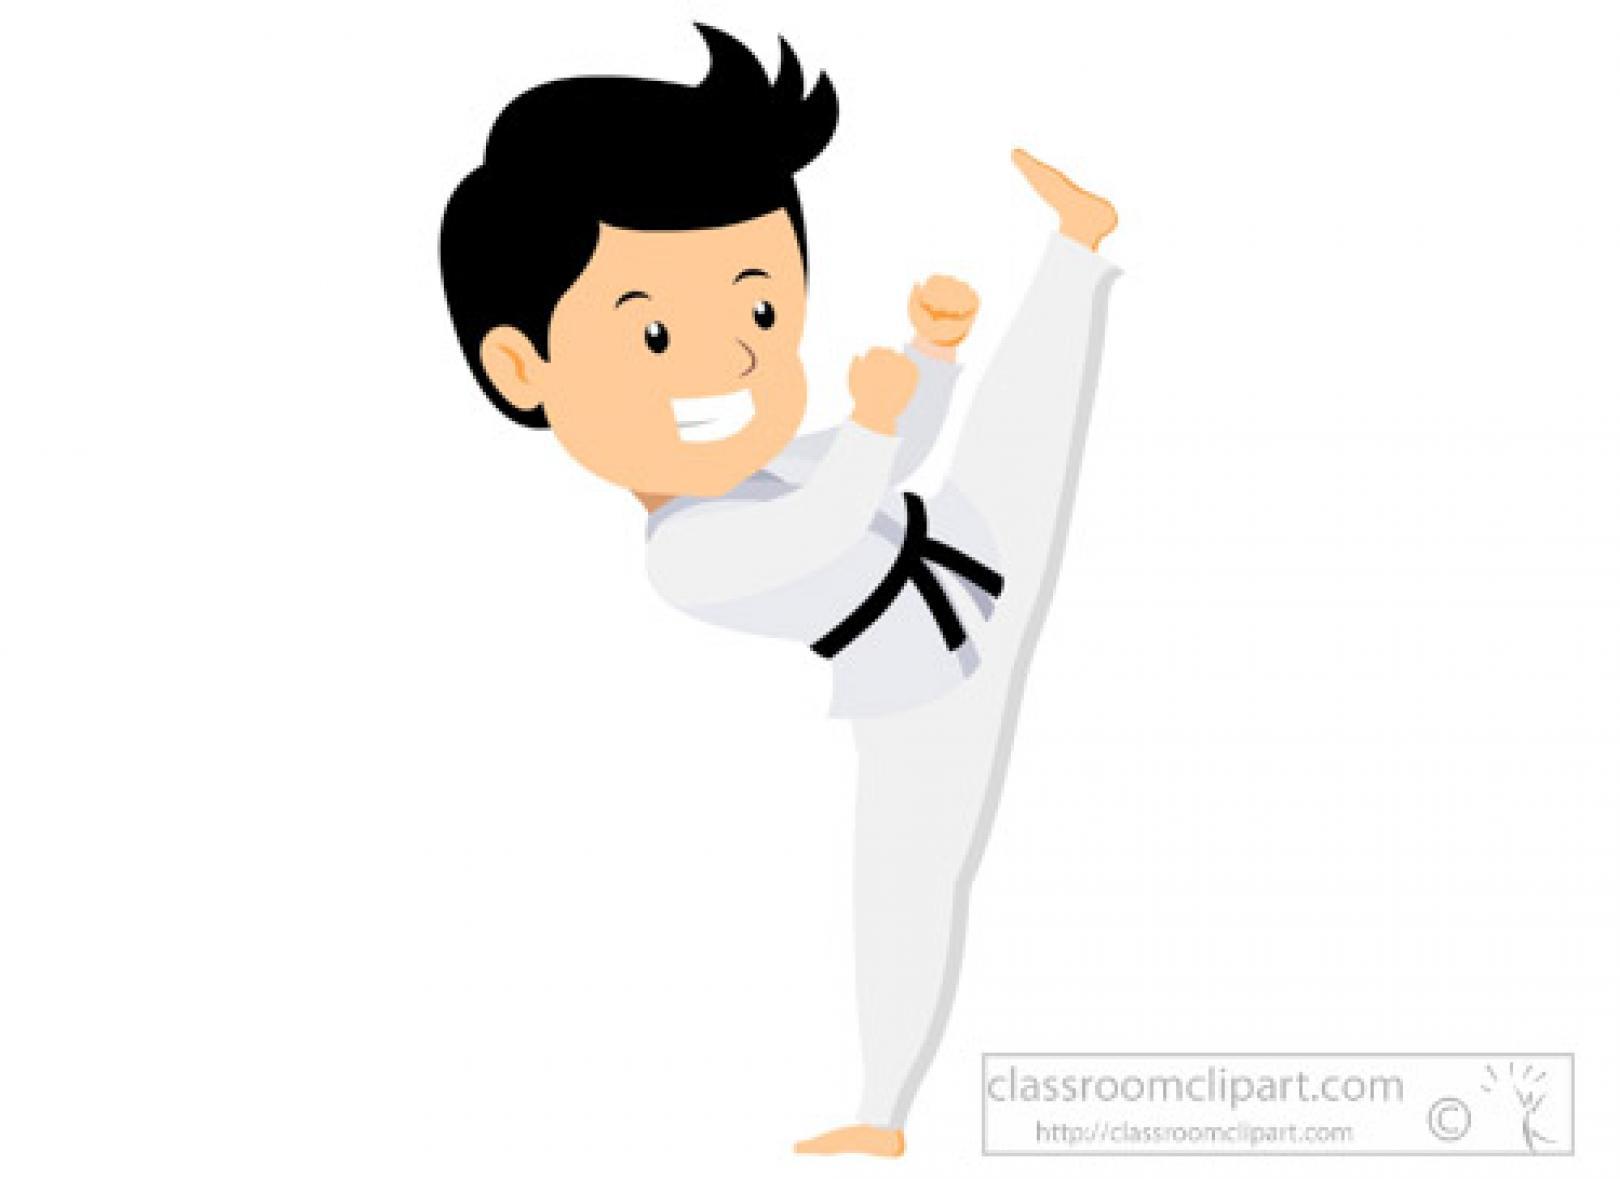 High kick clipart clipart royalty free library young-man-demonstrating-karate-high-kick-clipart.jpg - Cliparts Base clipart royalty free library